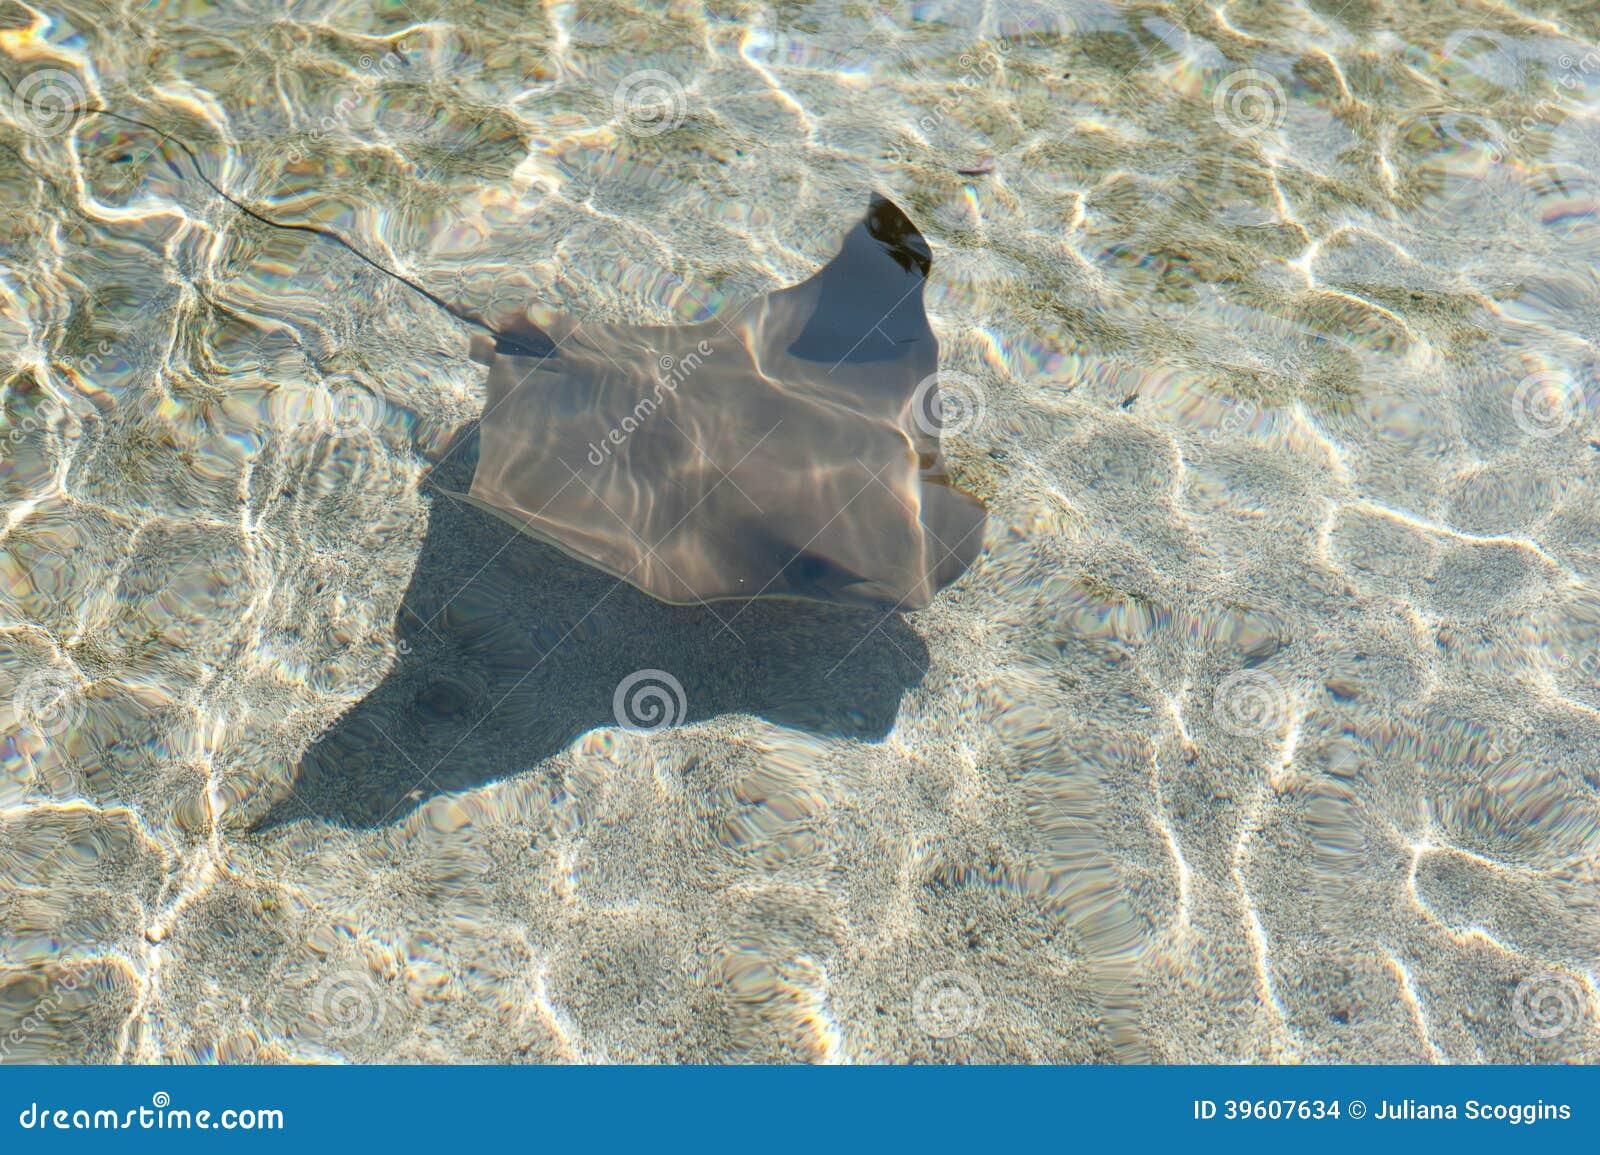 Cownose Ray am Aquarium des Pazifiks in Long Beach